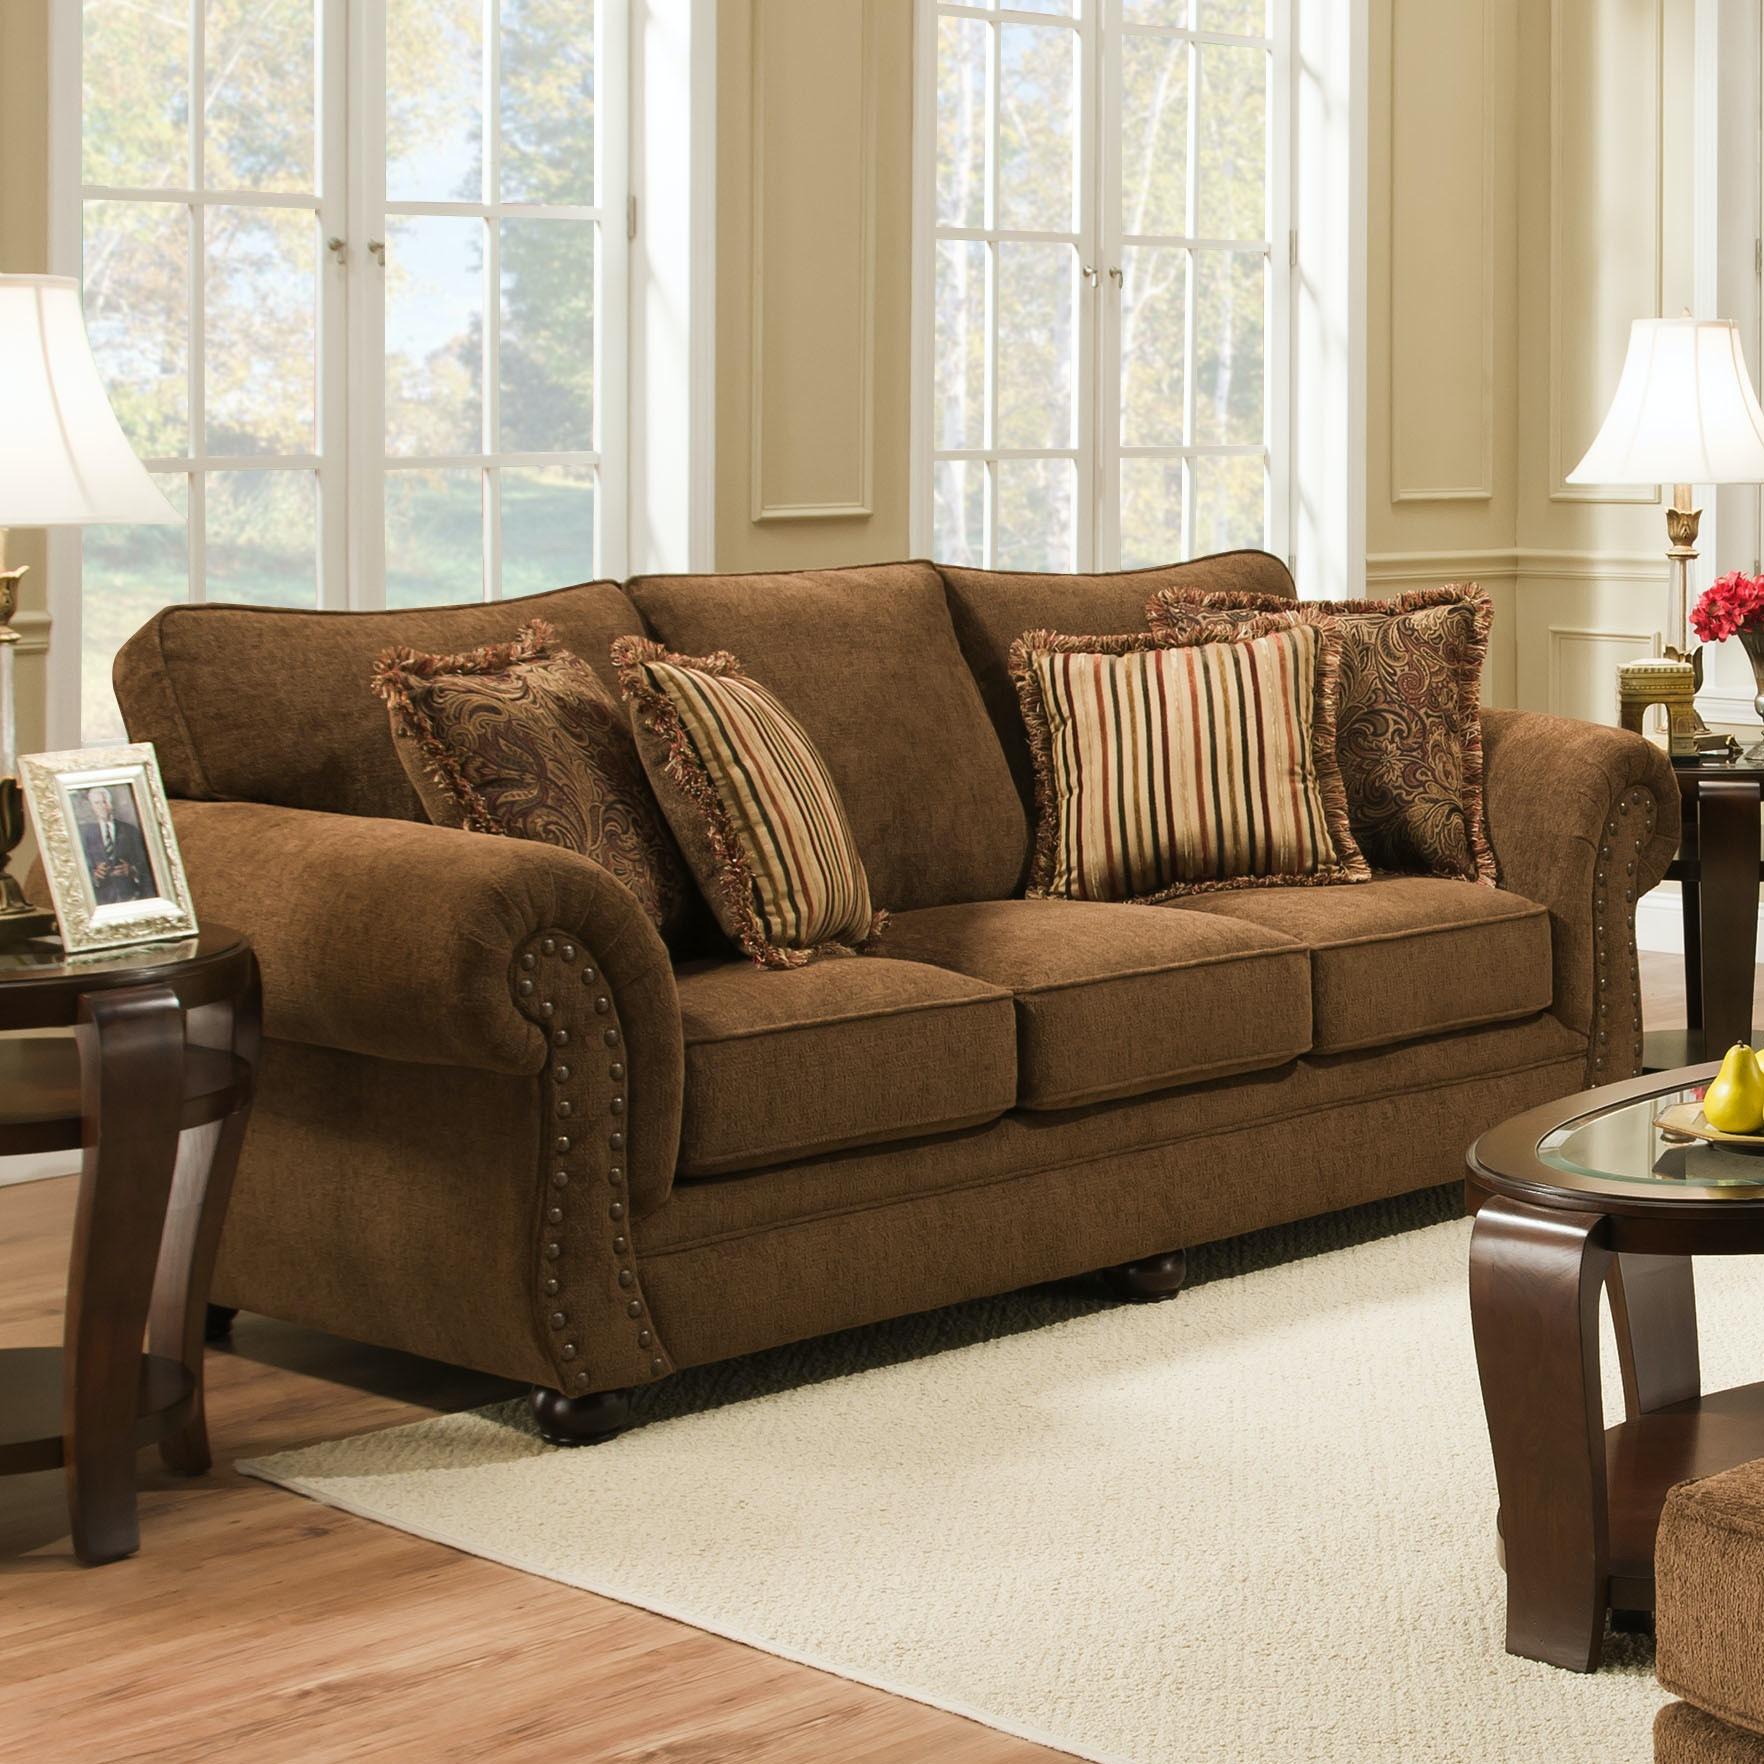 Simmons Upholstery Living Room Outback Chocolate Sofa 4277S